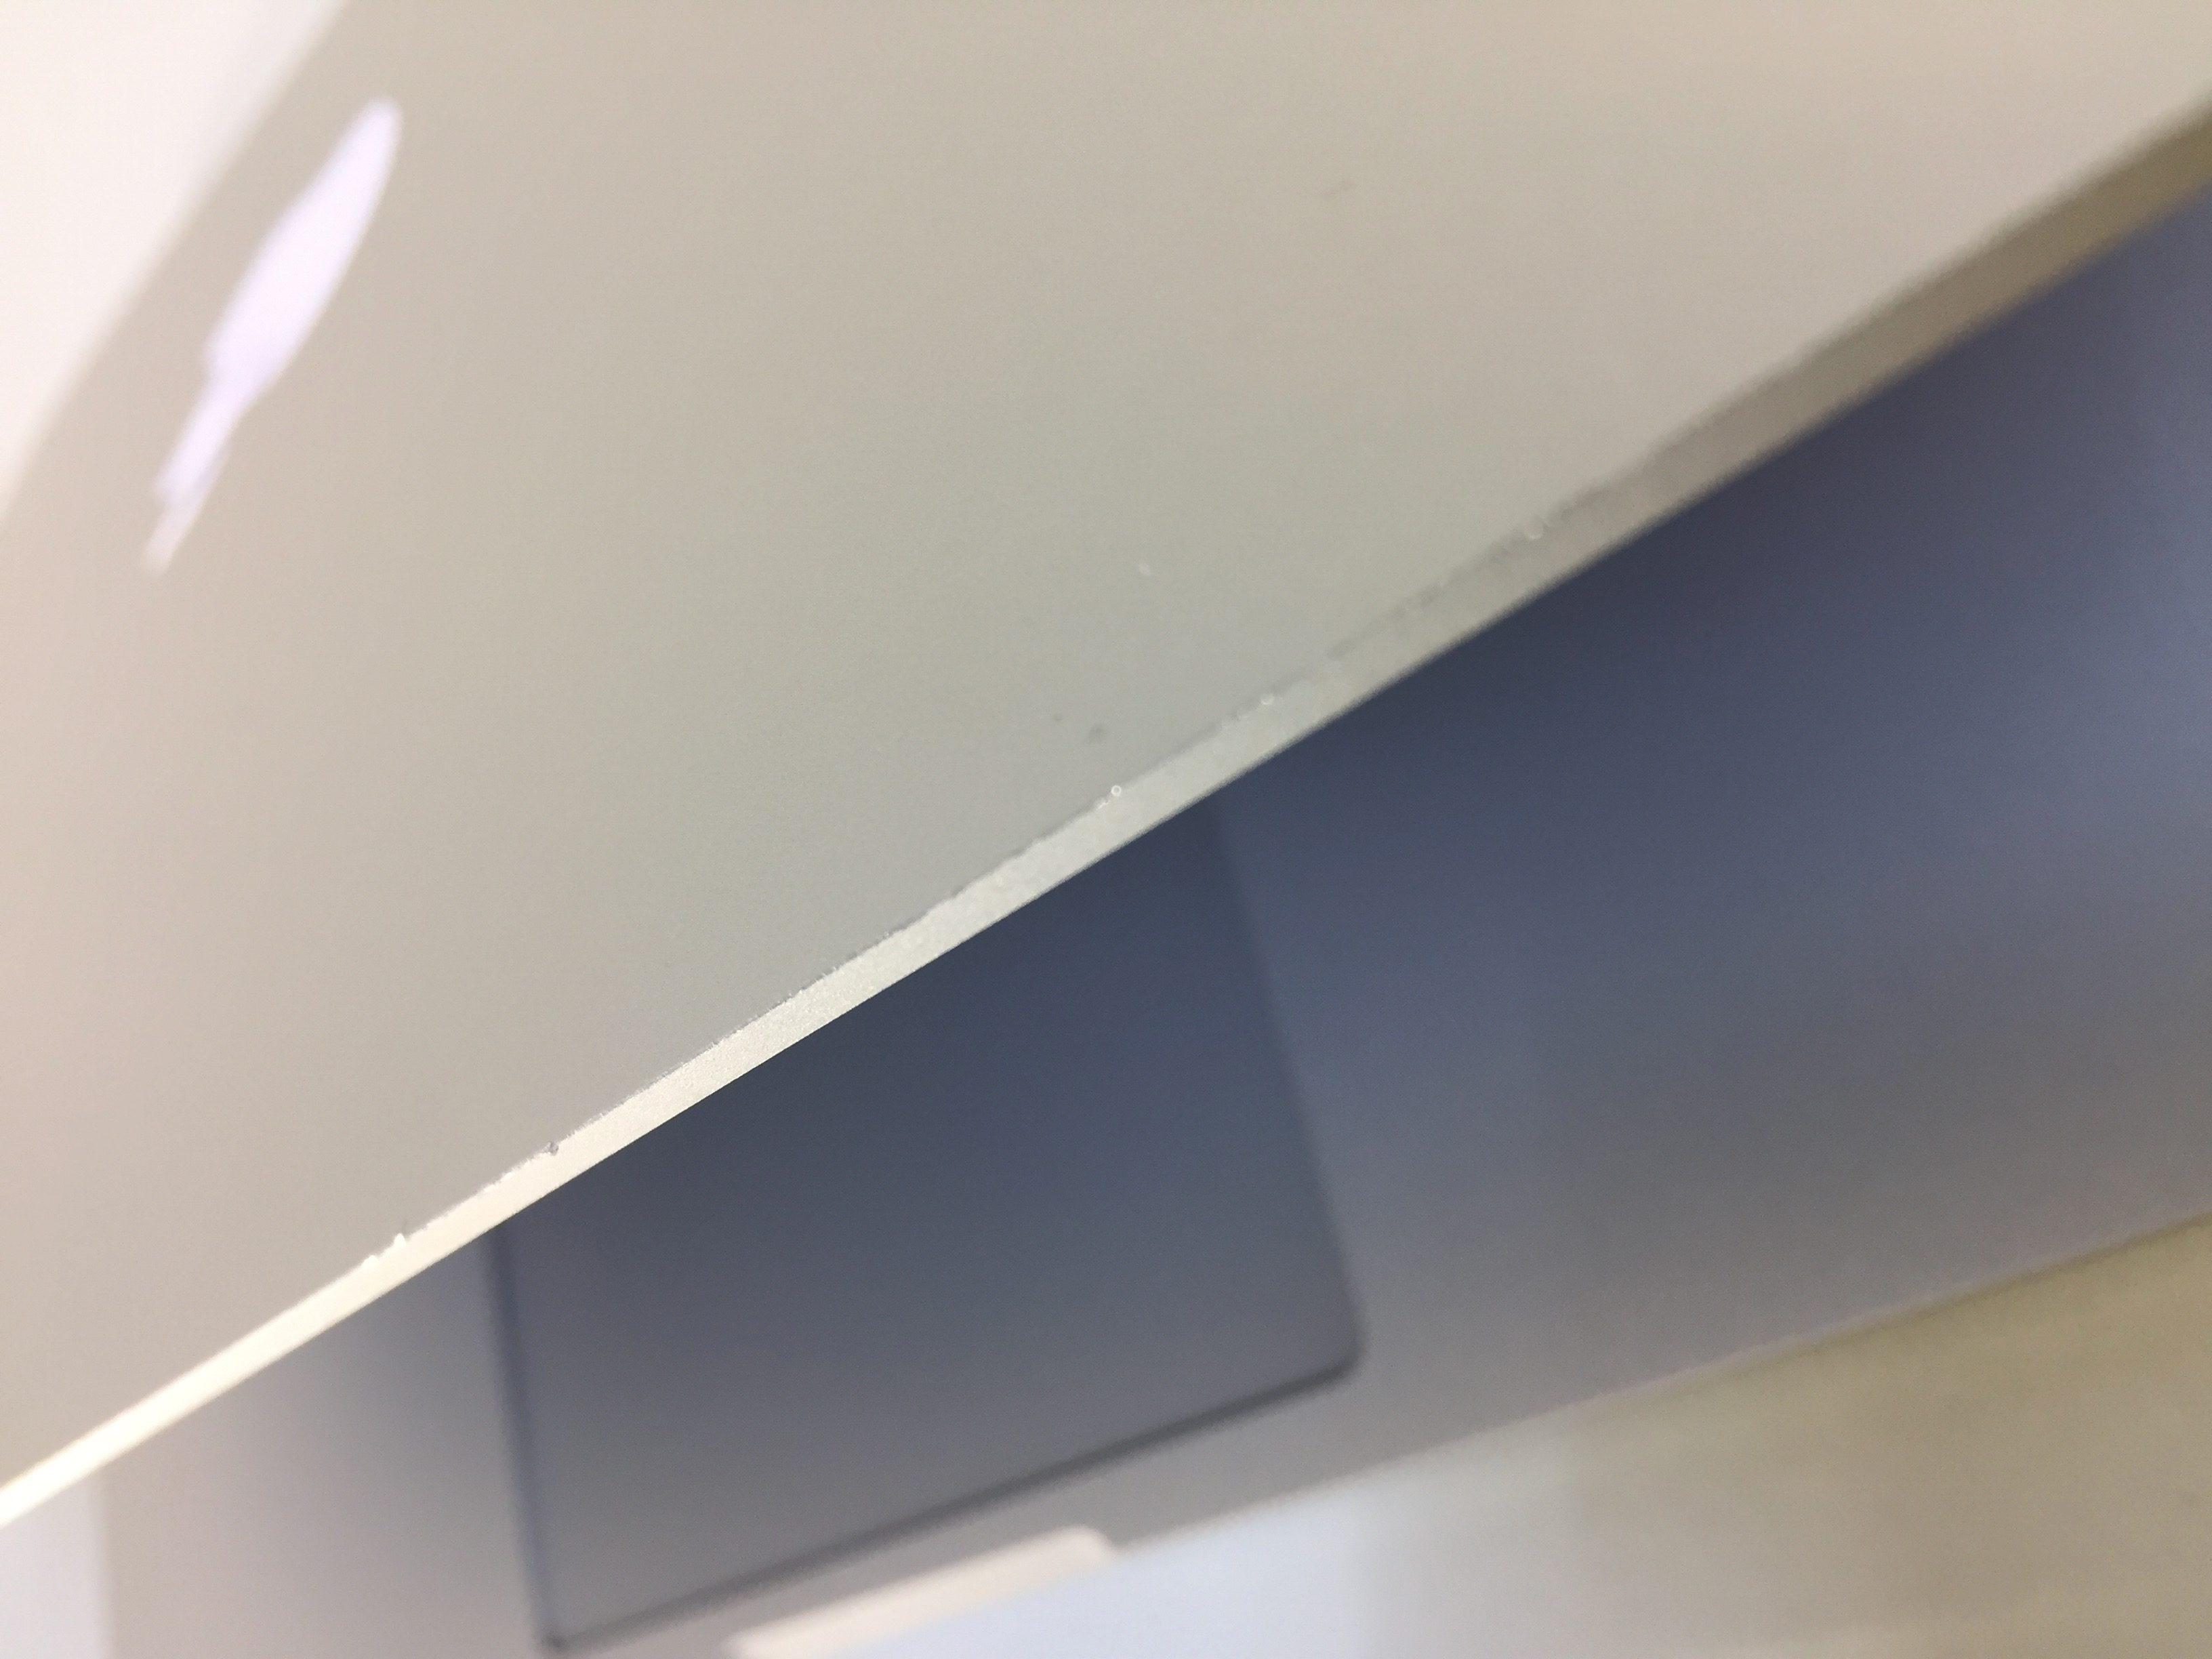 MacBook Pro 13-inch Retina, 2.6 Intel Core i5, 16 GB , 128 GB Flash, Bild 4